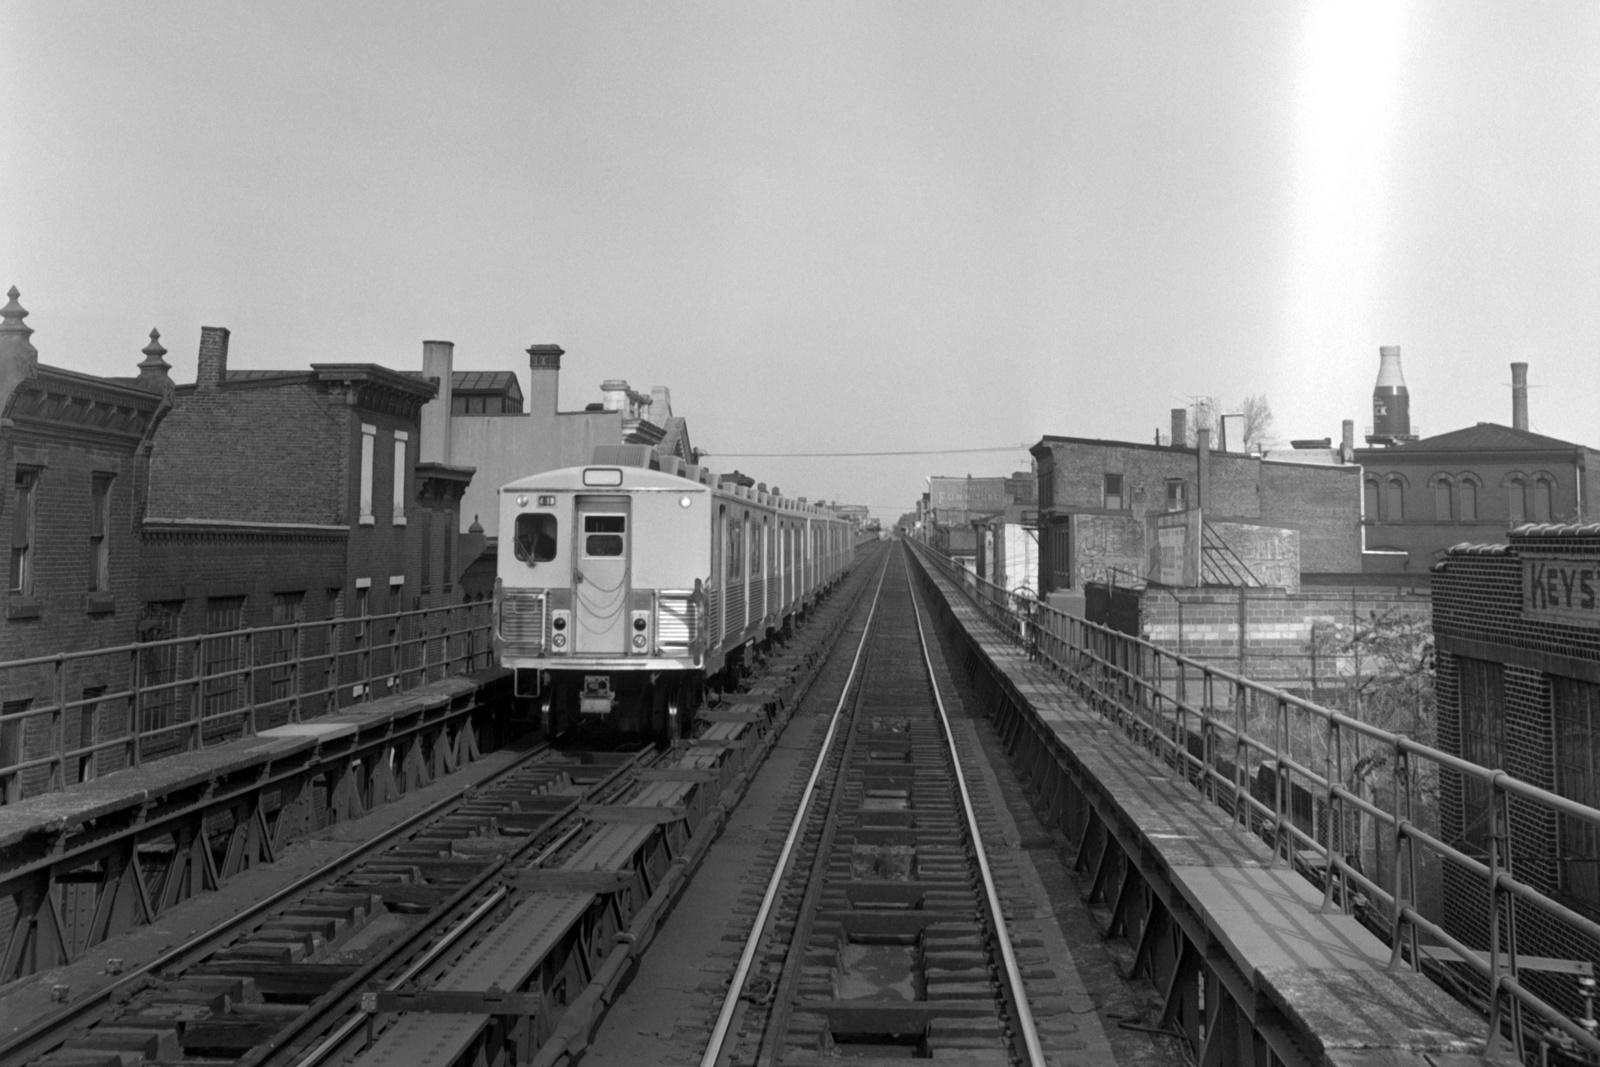 (466k, 1600x1067)<br><b>Country:</b> United States<br><b>City:</b> Philadelphia, PA<br><b>System:</b> SEPTA (or Predecessor)<br><b>Line:</b> Market-Frankford El<br><b>Location:</b> Berks<br><b>Car:</b> SEPTA M-3 (Budd, 1960)  <br><b>Collection of:</b> David Pirmann<br><b>Date:</b> 10/28/1967<br><b>Viewed (this week/total):</b> 0 / 100